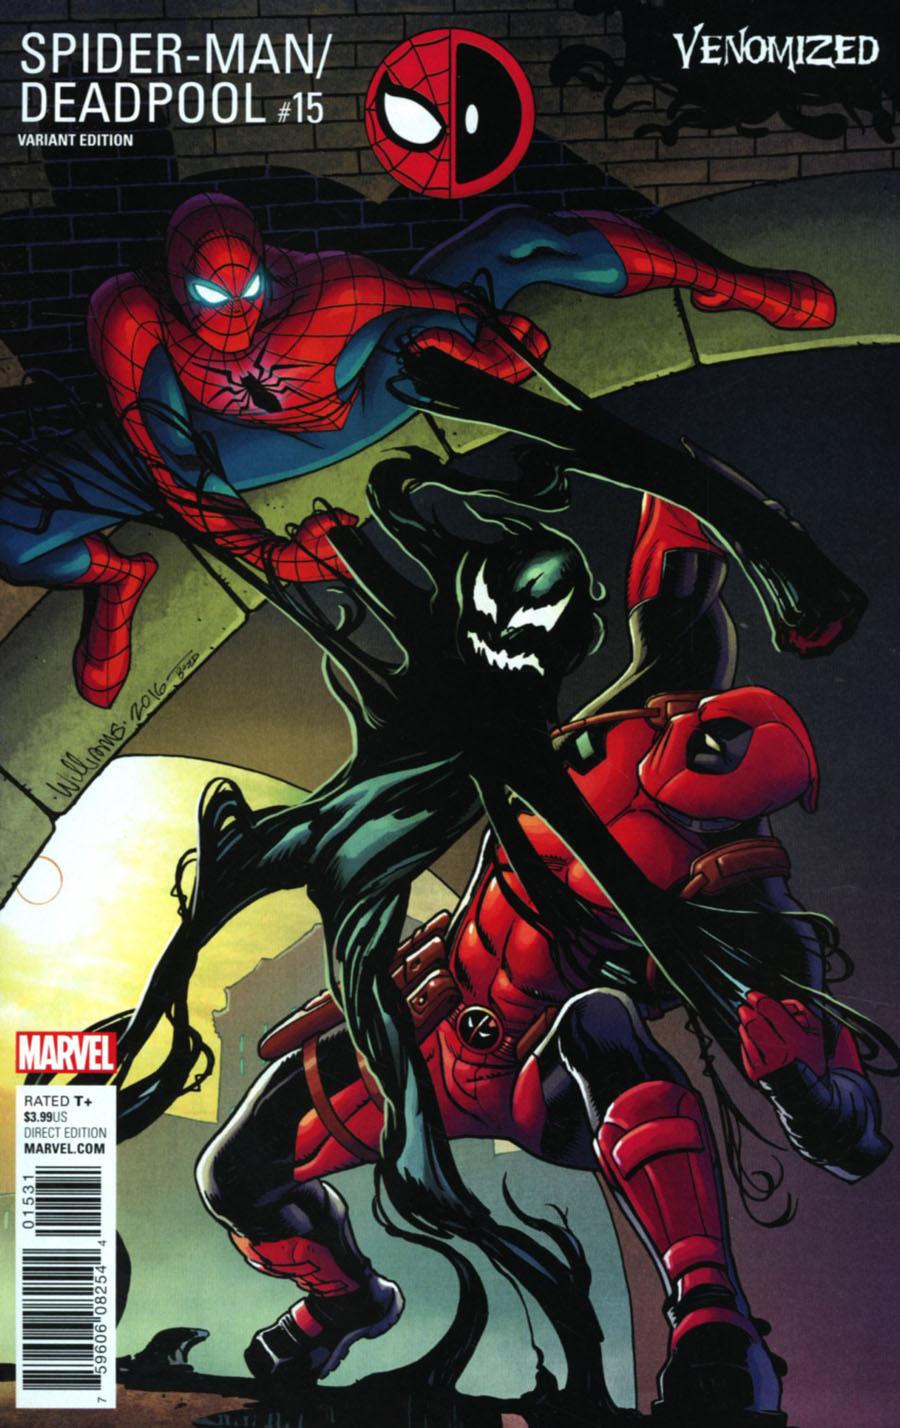 Spider-Man Deadpool #15 Cover C Variant Dave Williams Venomized Cover (Til Death Do Us Part 2)